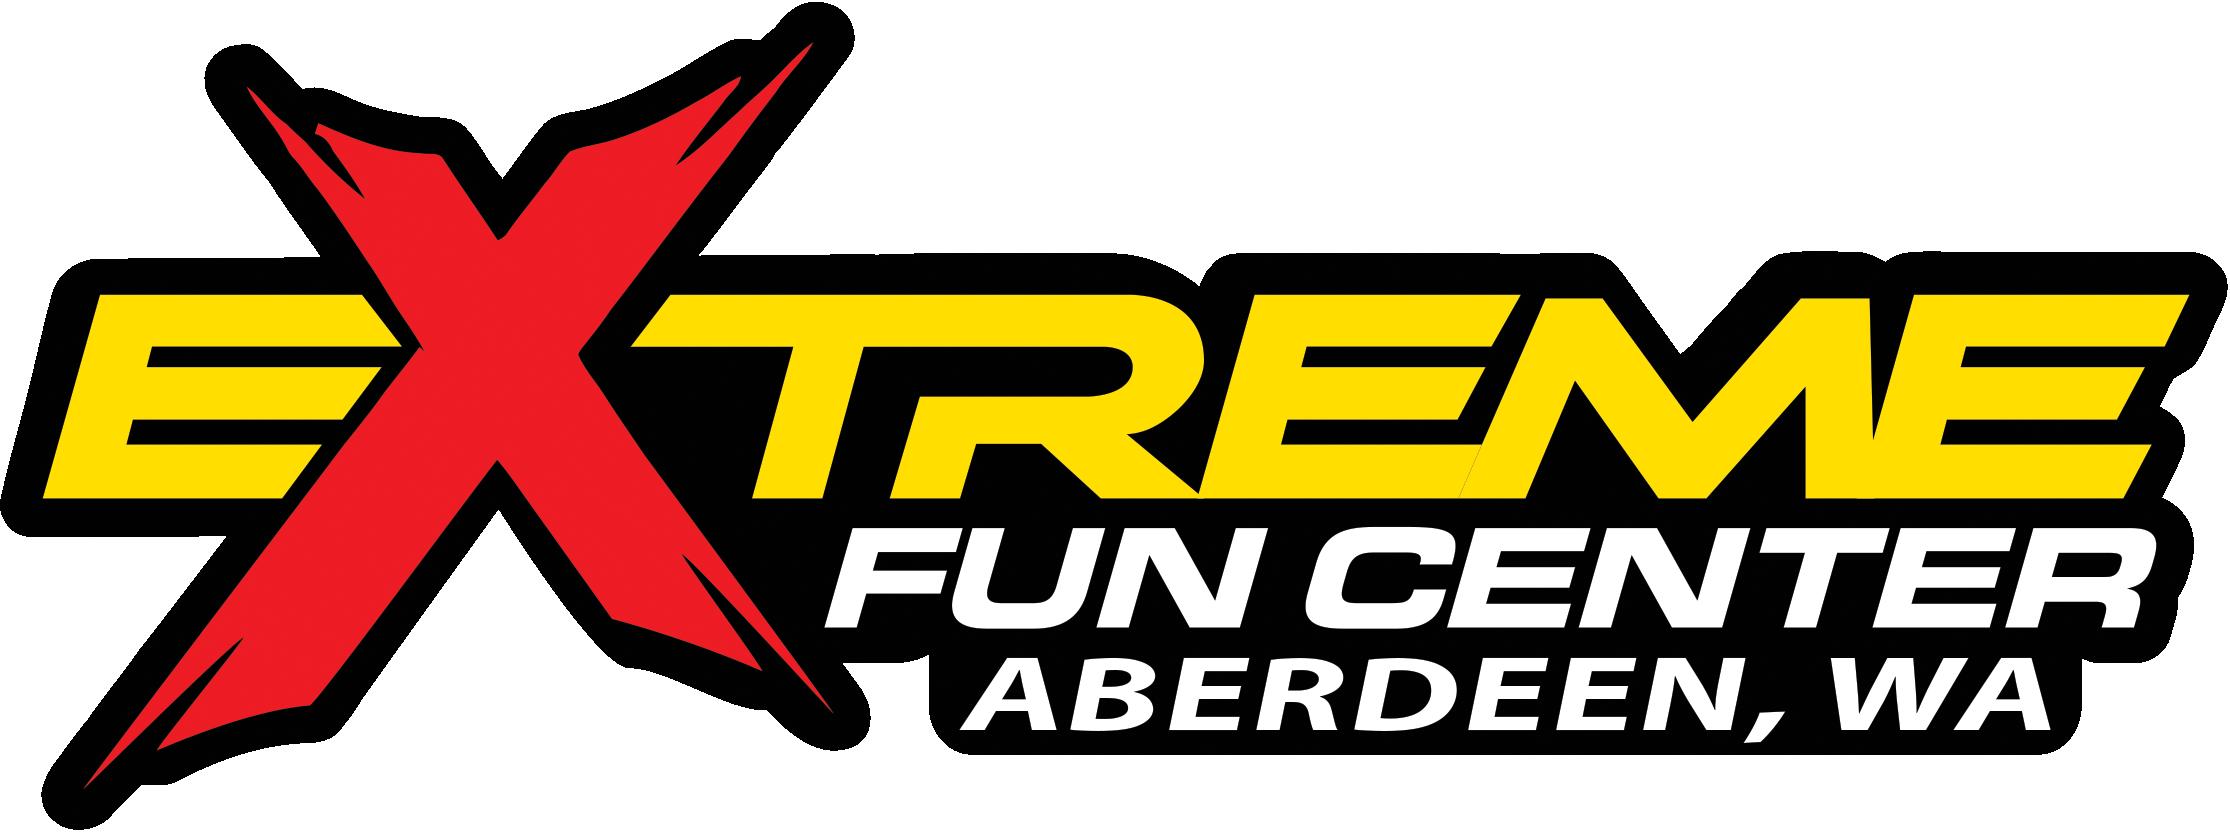 Extreme Logo Aberdeen Wa Aberdeen Extreme Fun Center